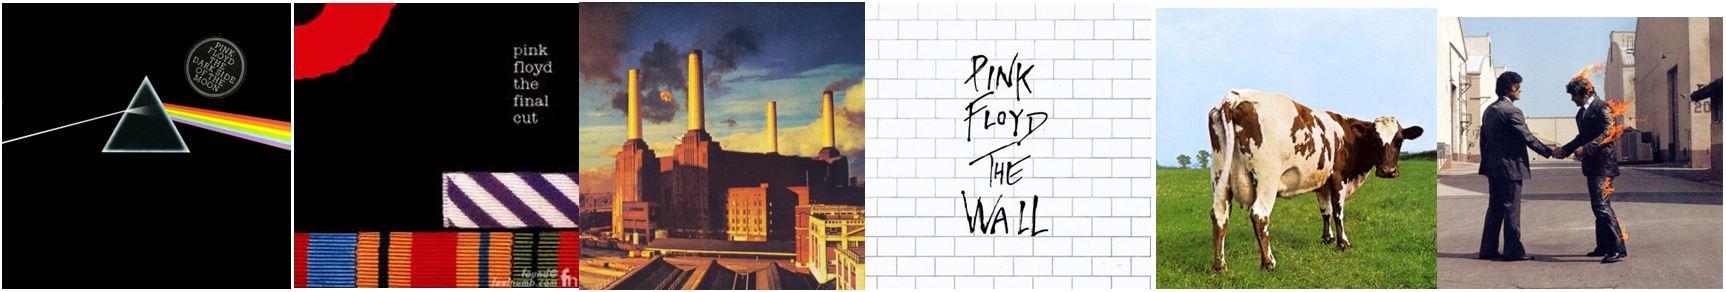 Photo PINK ALBUM COVERs